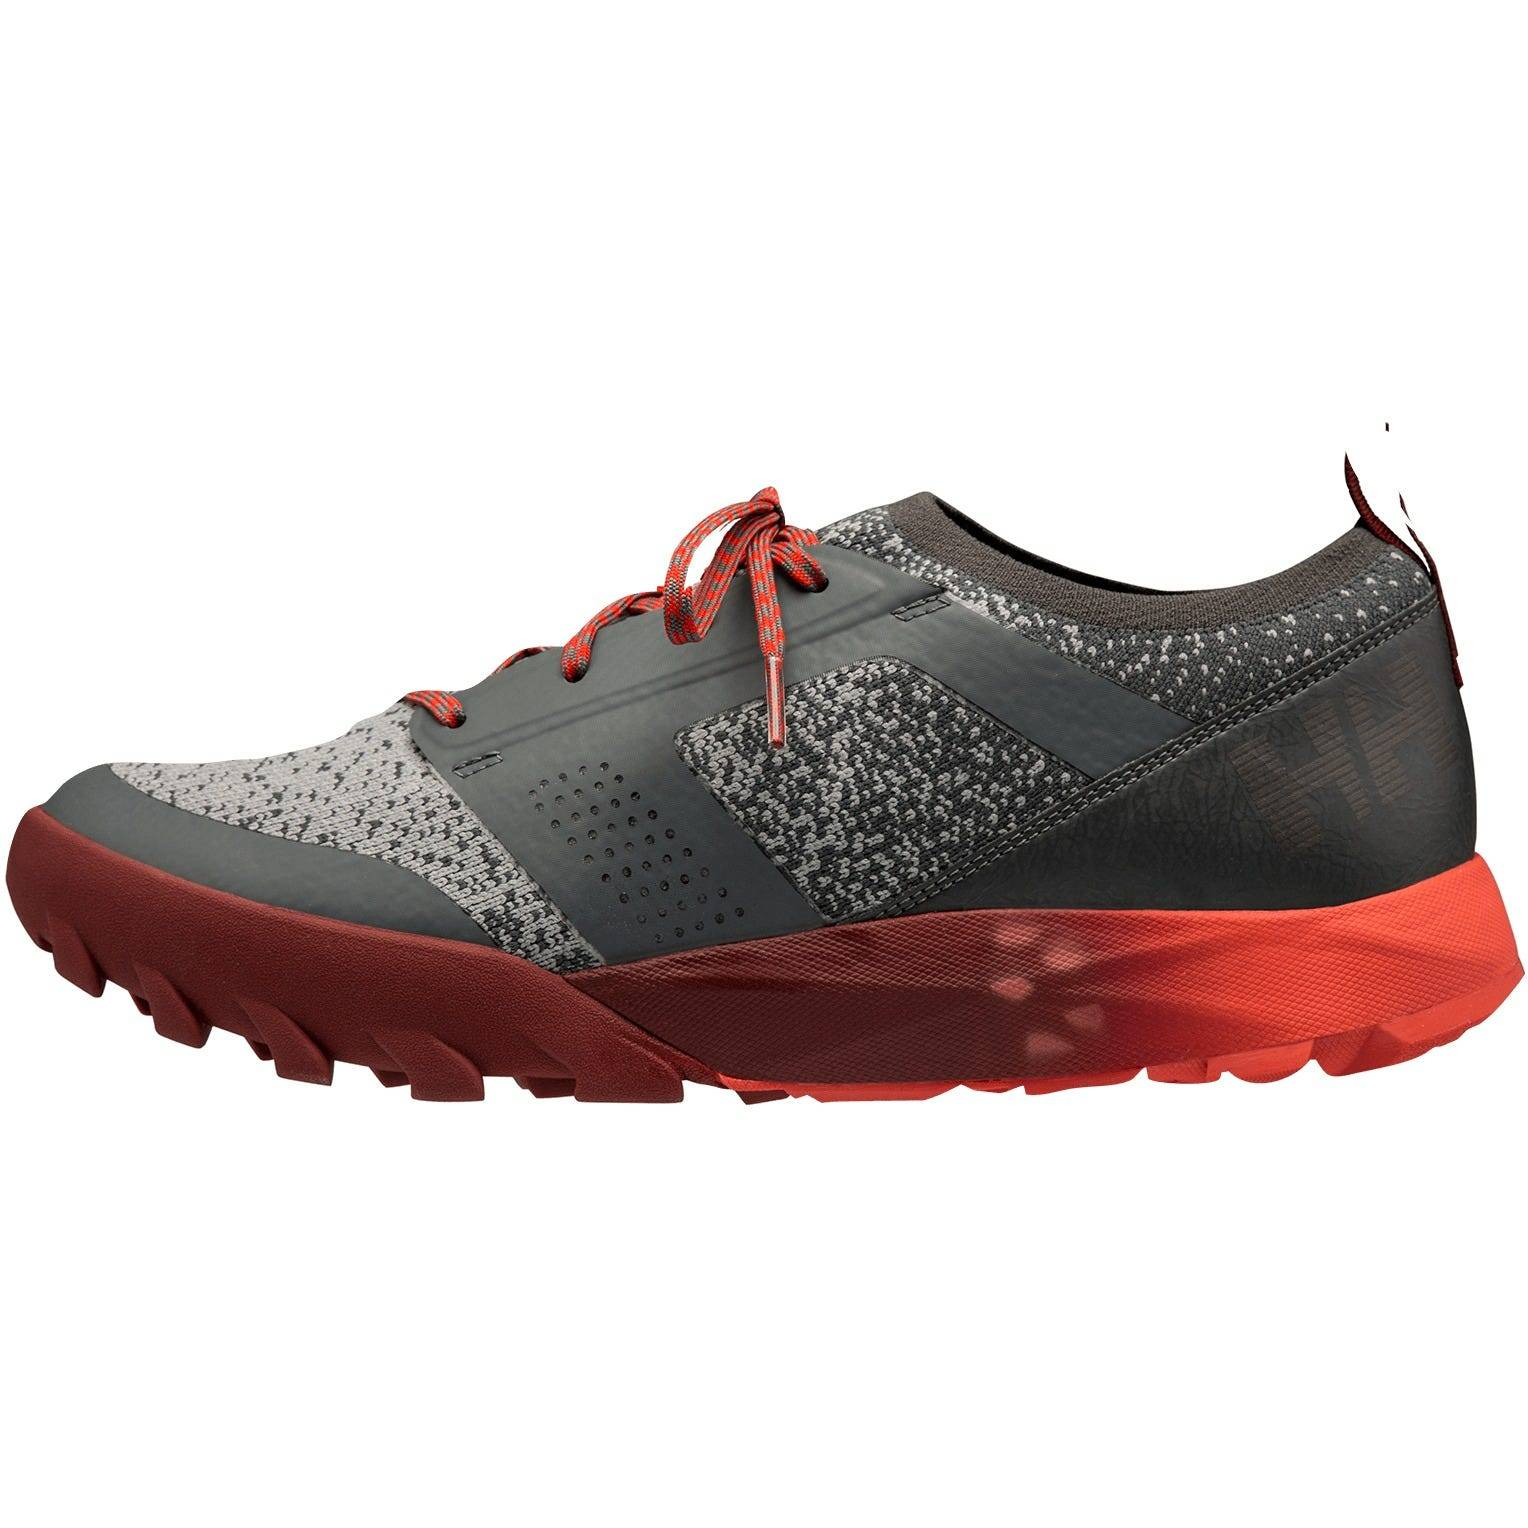 Helly Hansen Loke Dash Mens Hiking Boot Blue 45/11